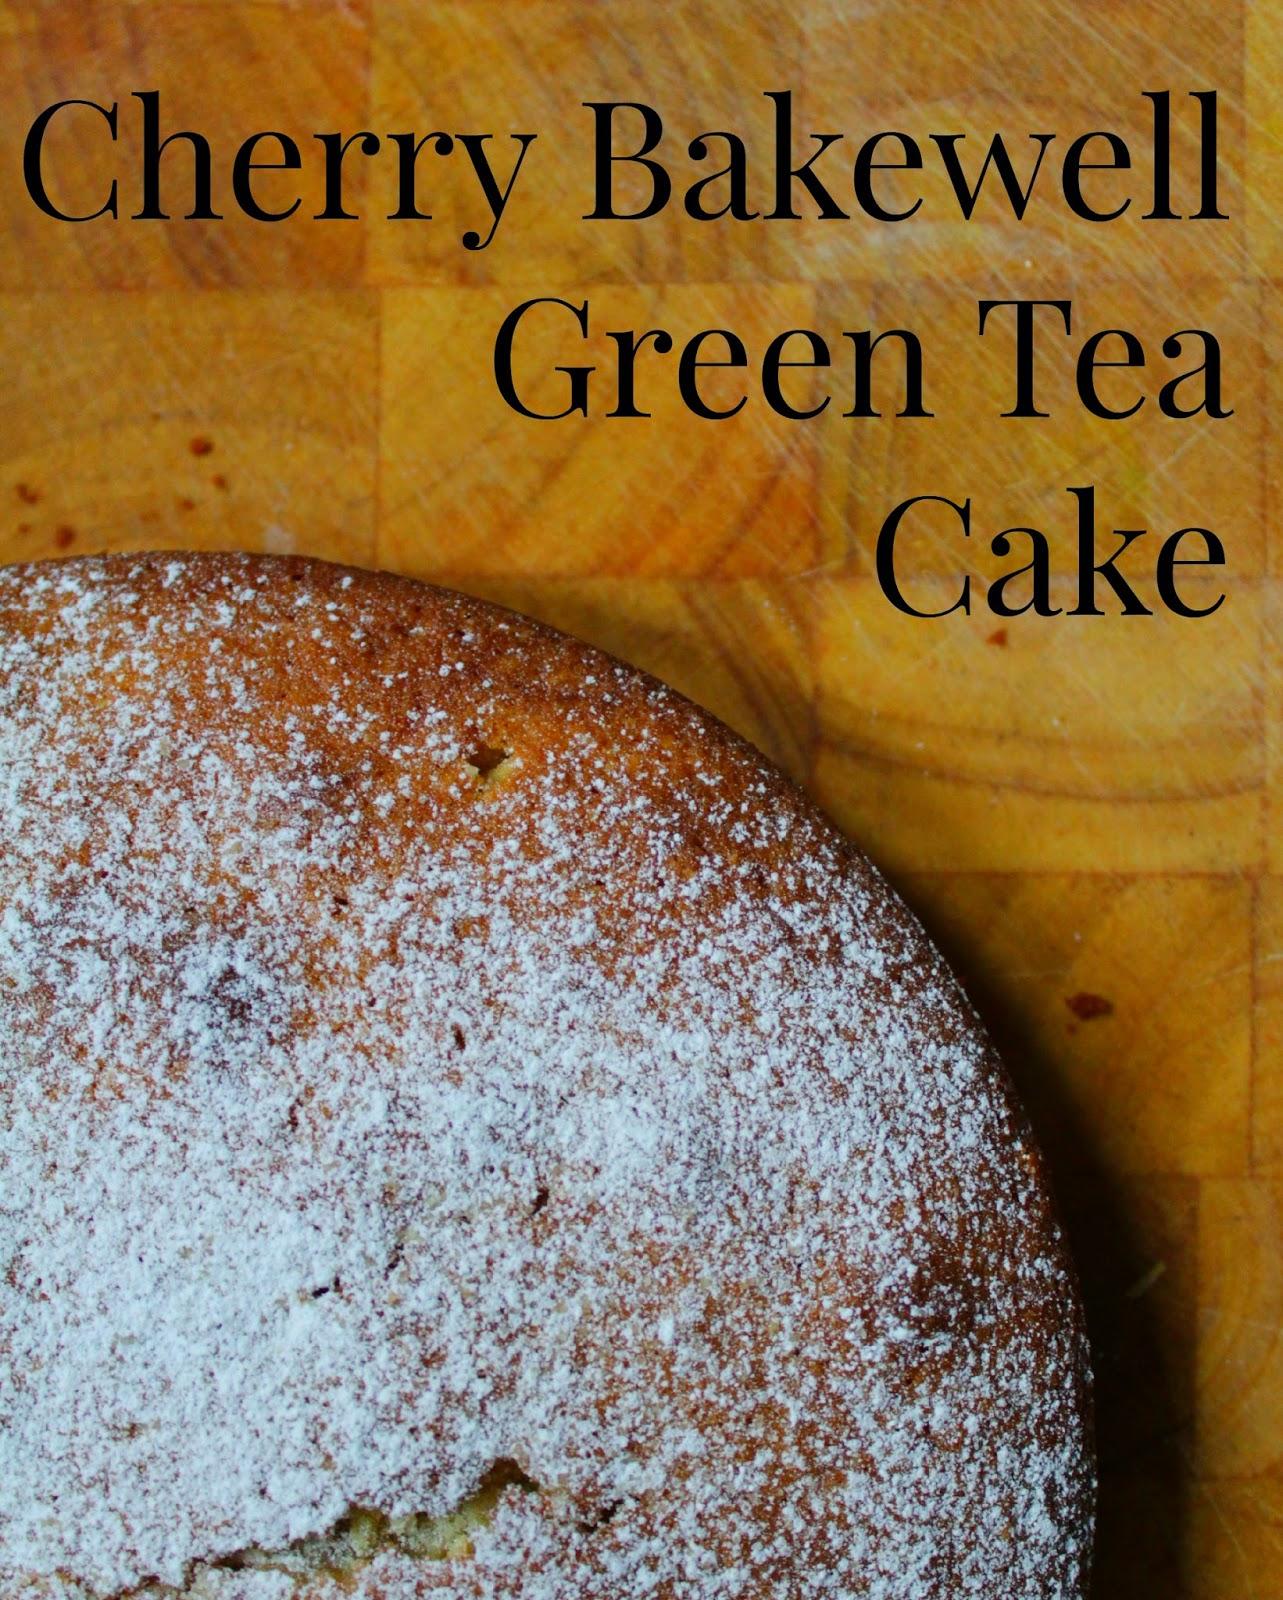 Cherry Bakewell Green Tea Cake